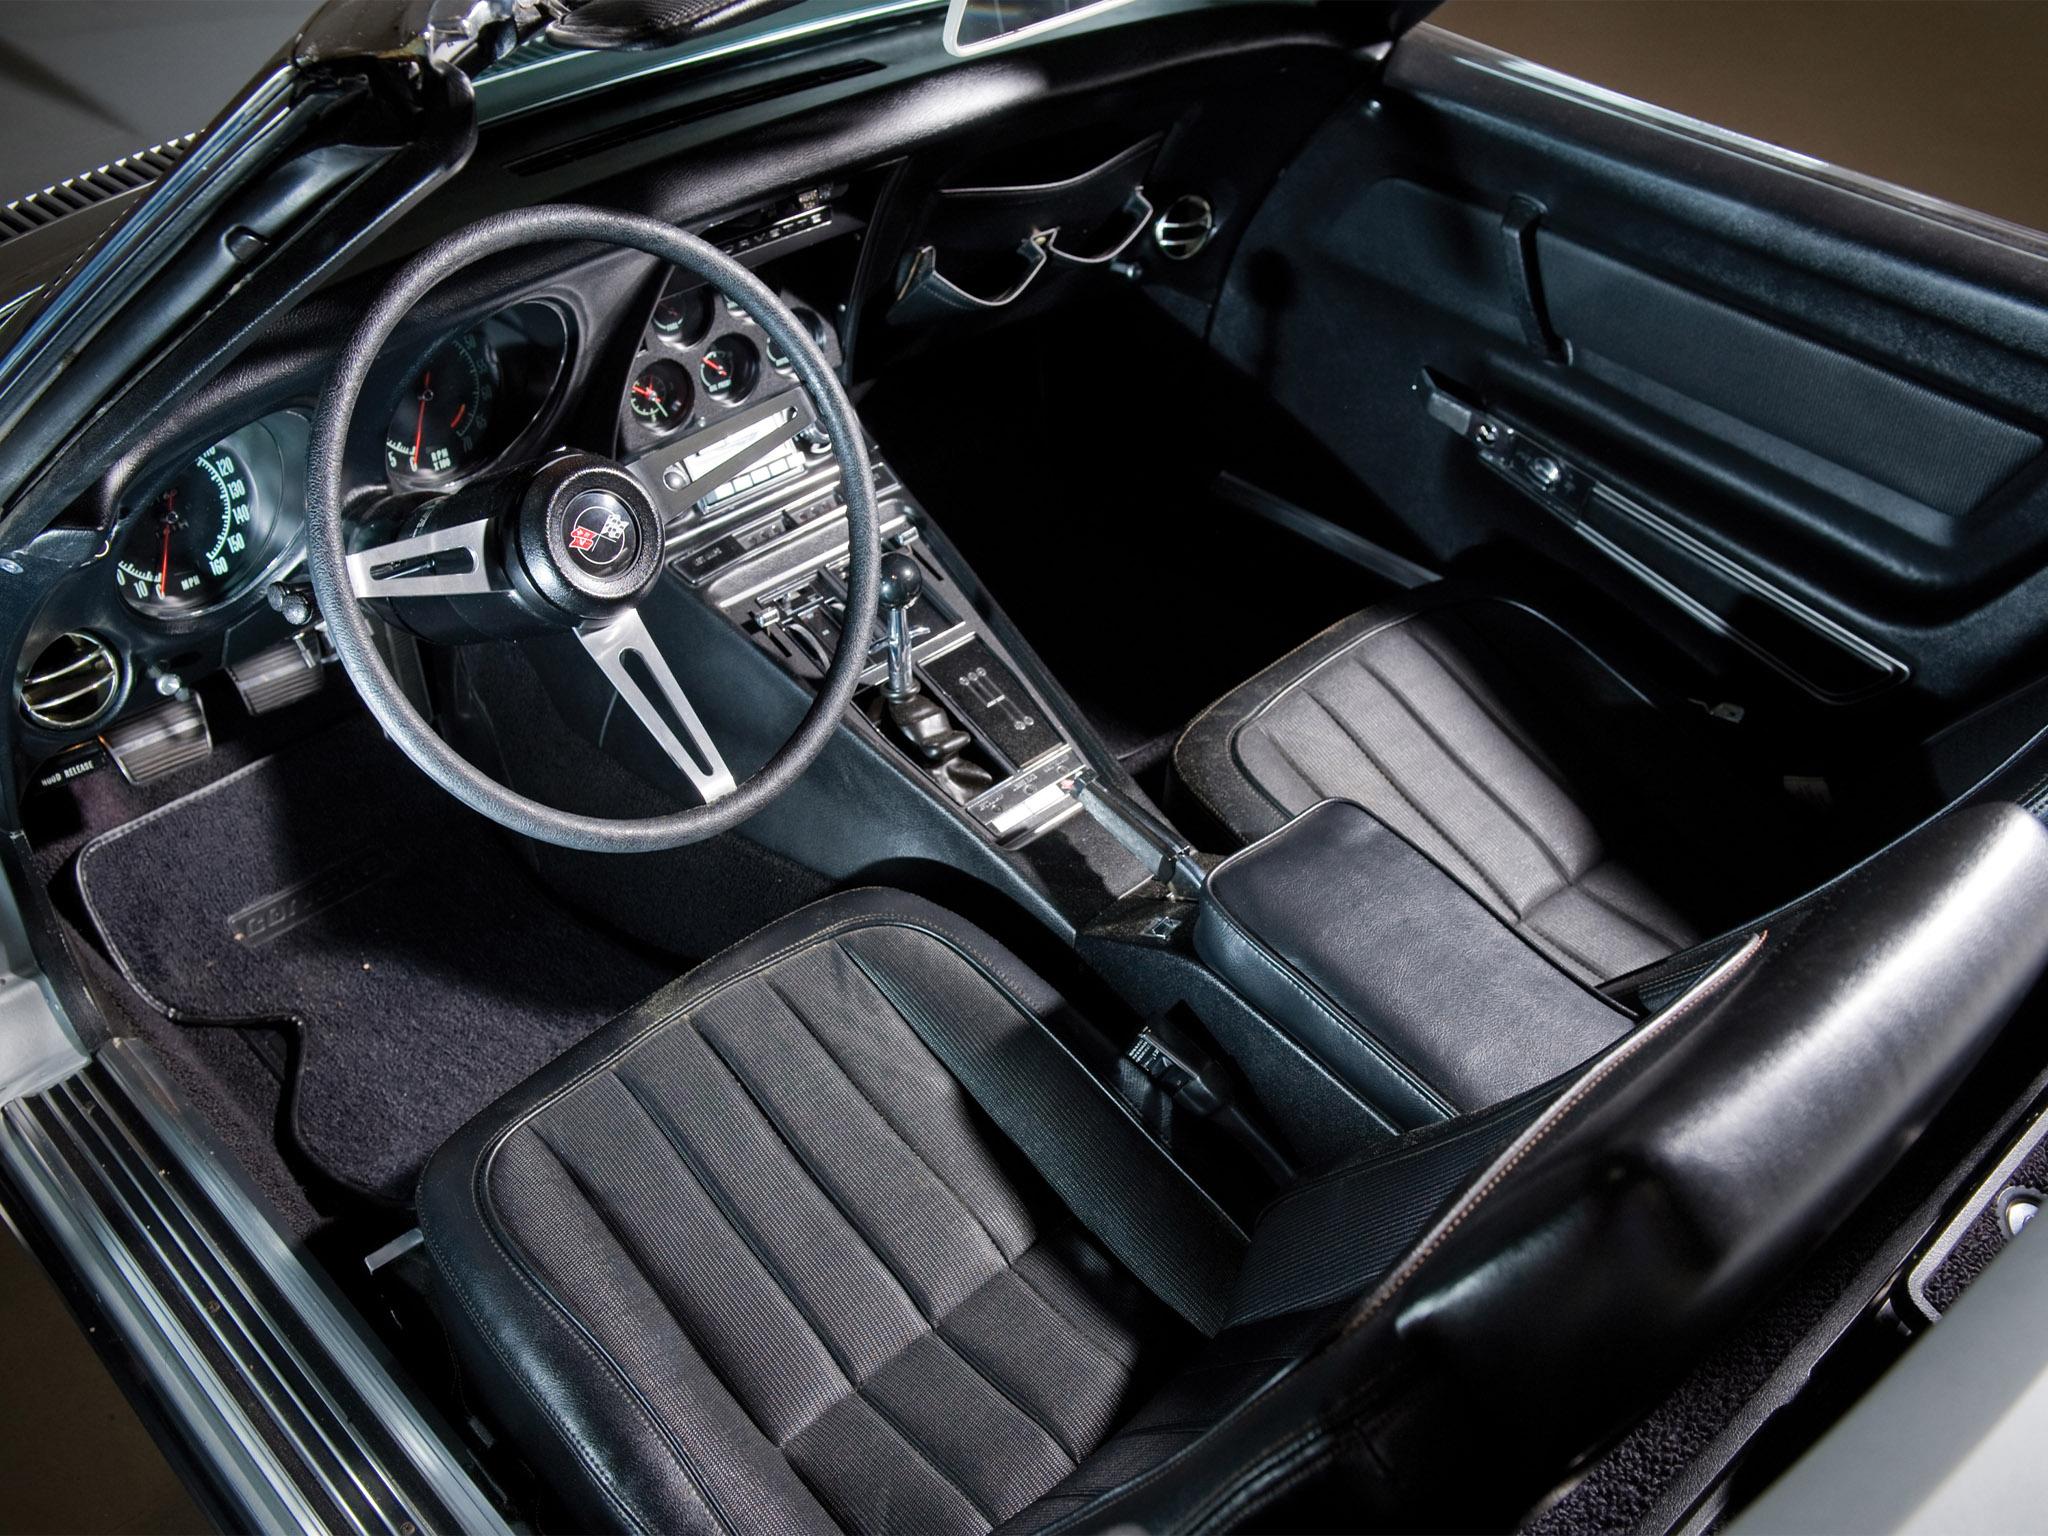 1969 chevrolet corvette c3 stingray l71 427 convertible classic muscle - Corvette 2013 Stingray Interior